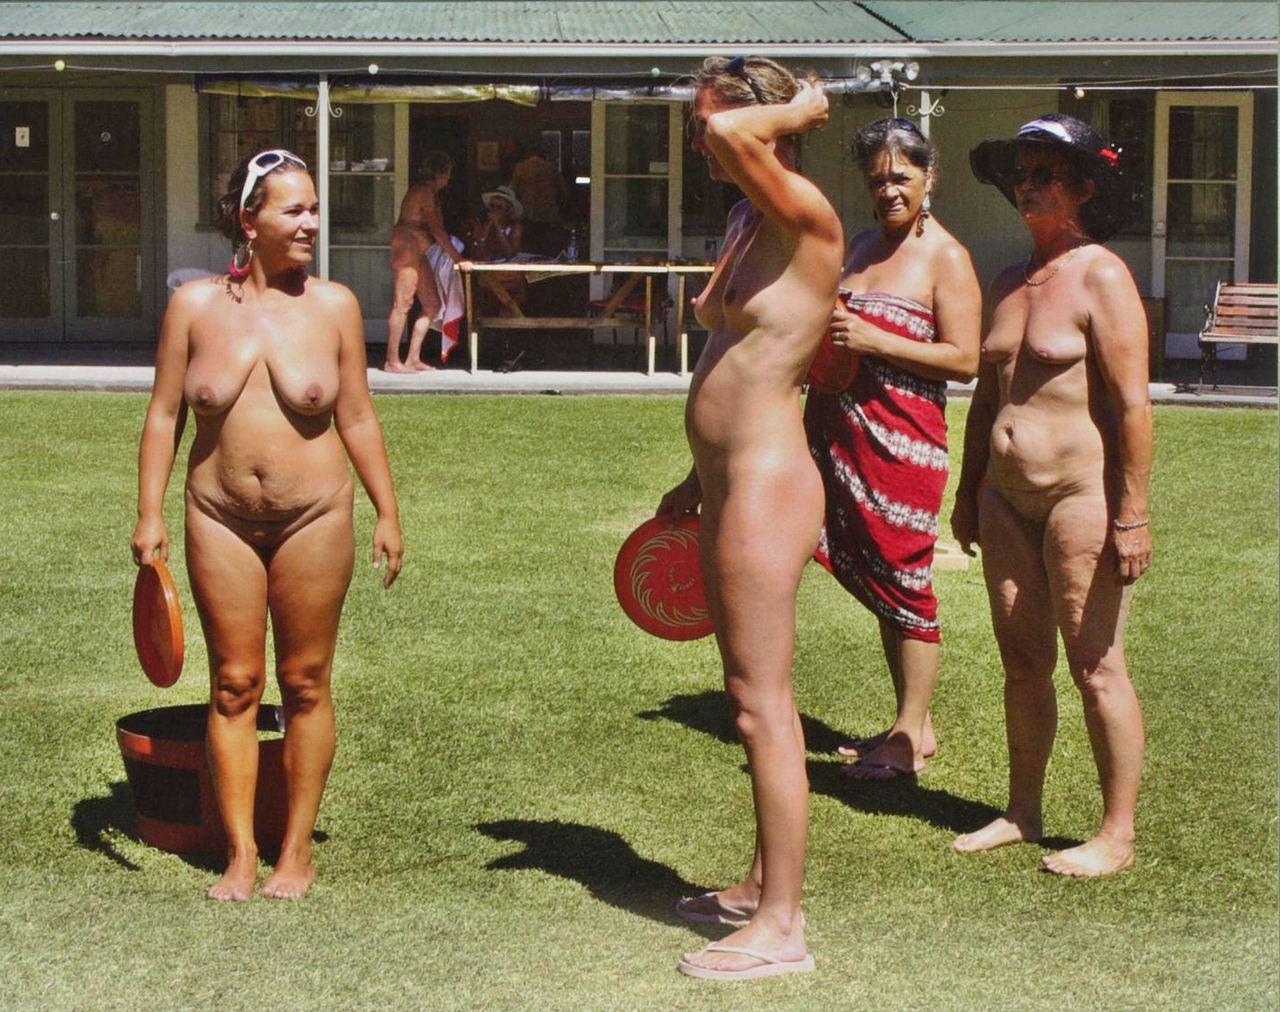 parks in oklahoma Nudist